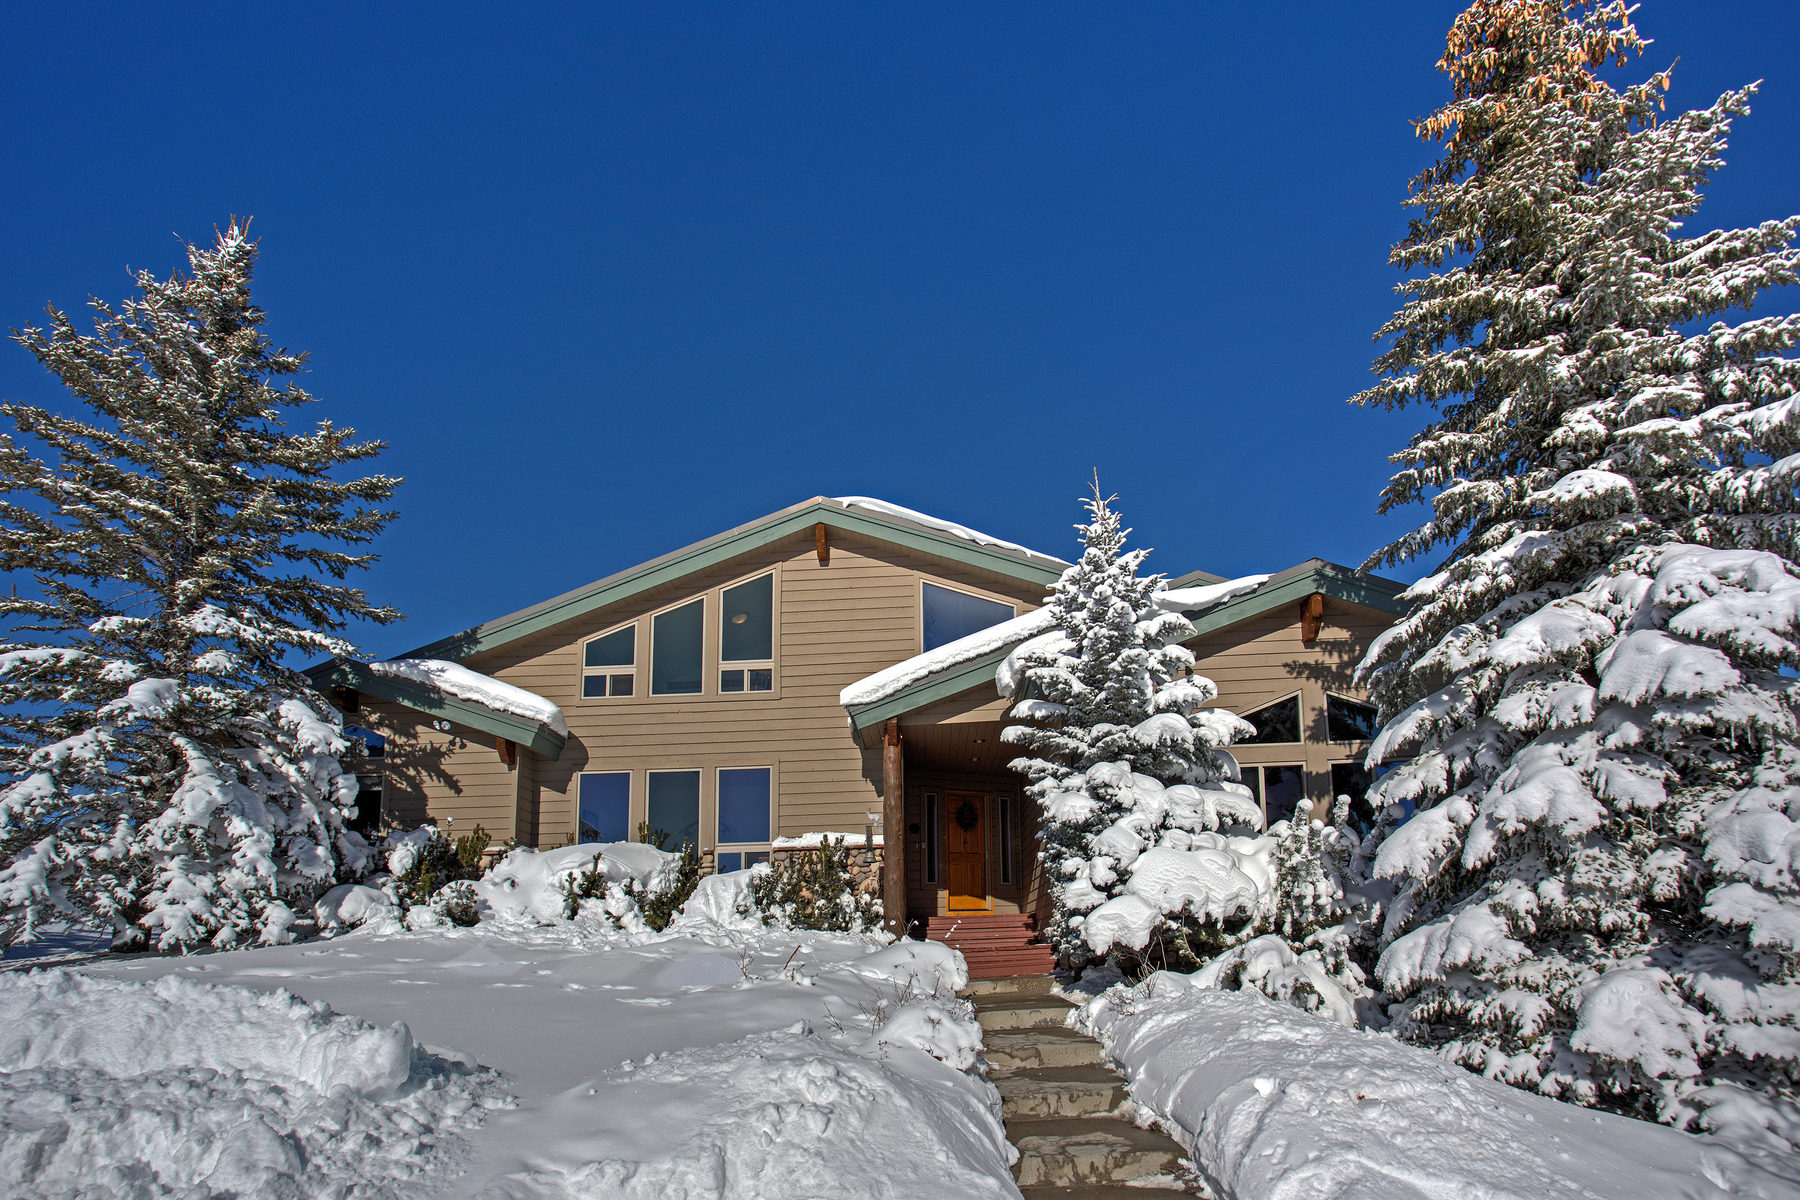 独户住宅 为 销售 在 Stargazer Ranch, 4216 Sq. Feet On 46 Acres 4700 W Highway 248 Kamas, 犹他州, 84036 美国